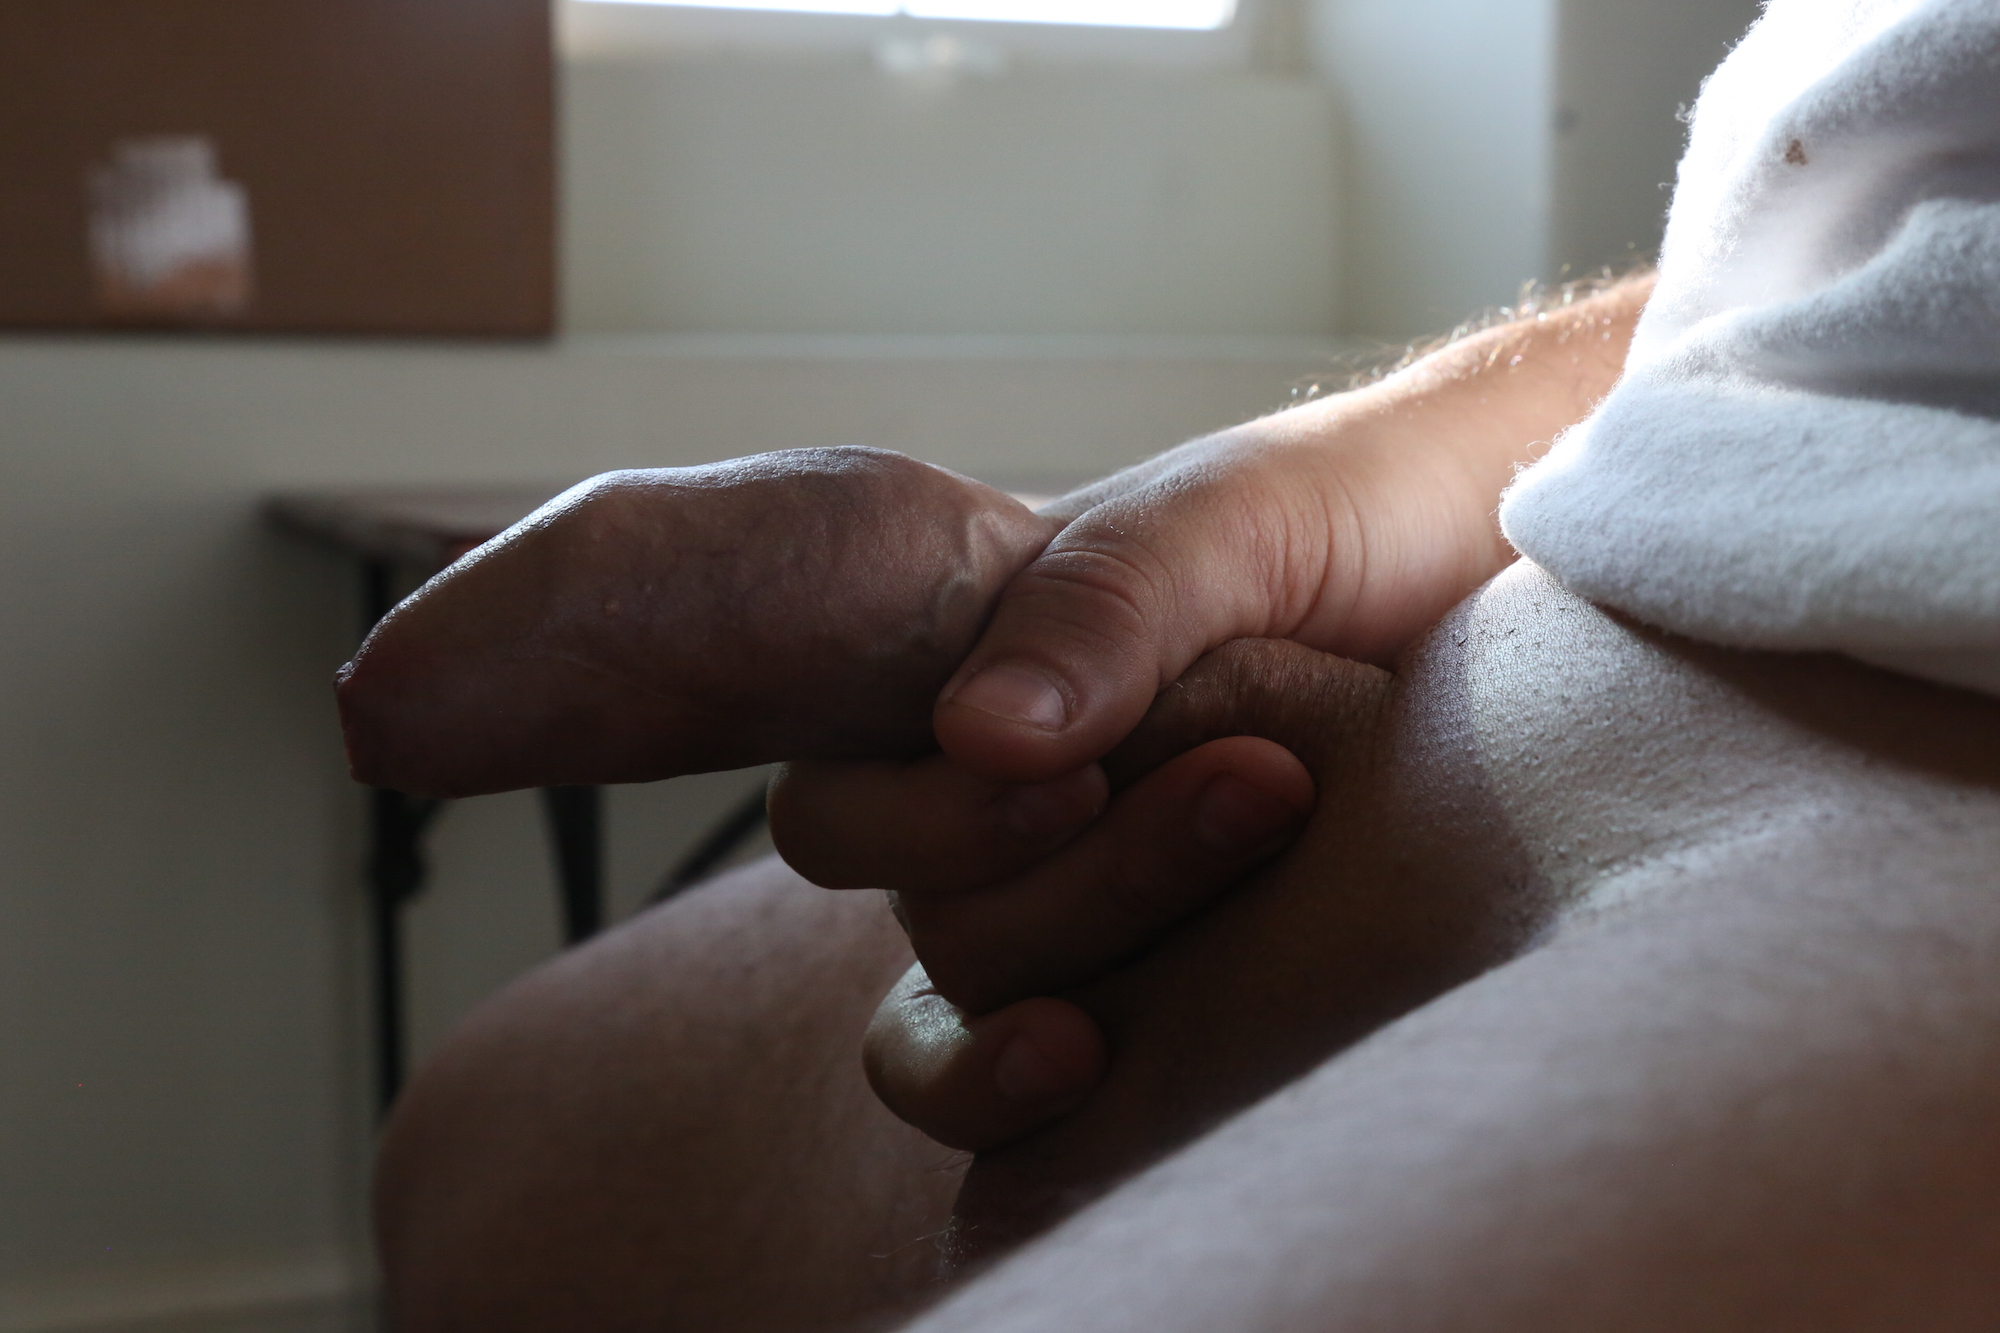 mapy sex cz hluboké hrdlo